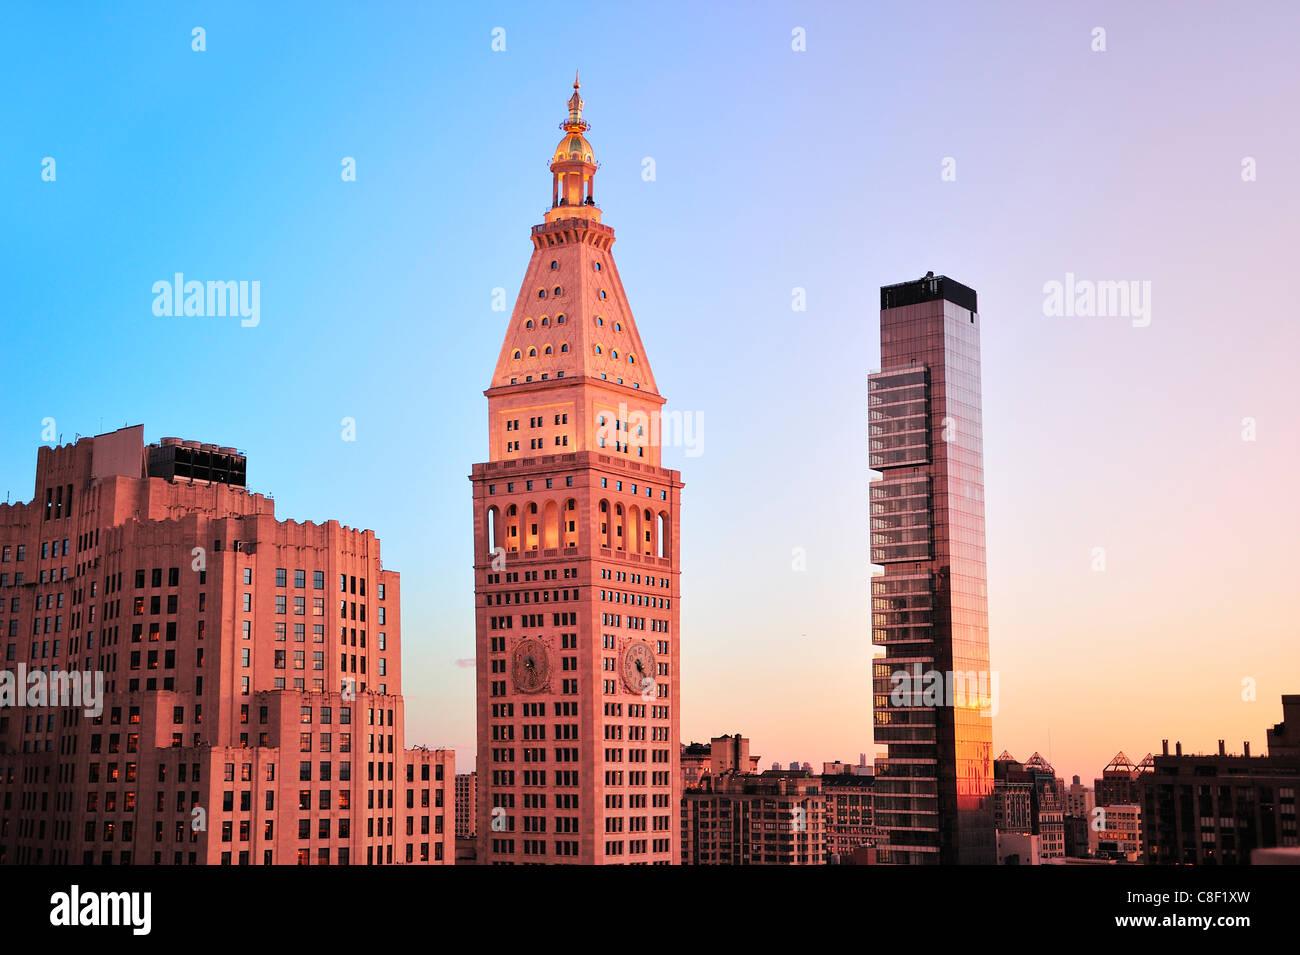 Metropolitan, Life Insurance, Company, Met, Building, Manhattan, New York, USA, United States, America, - Stock Image